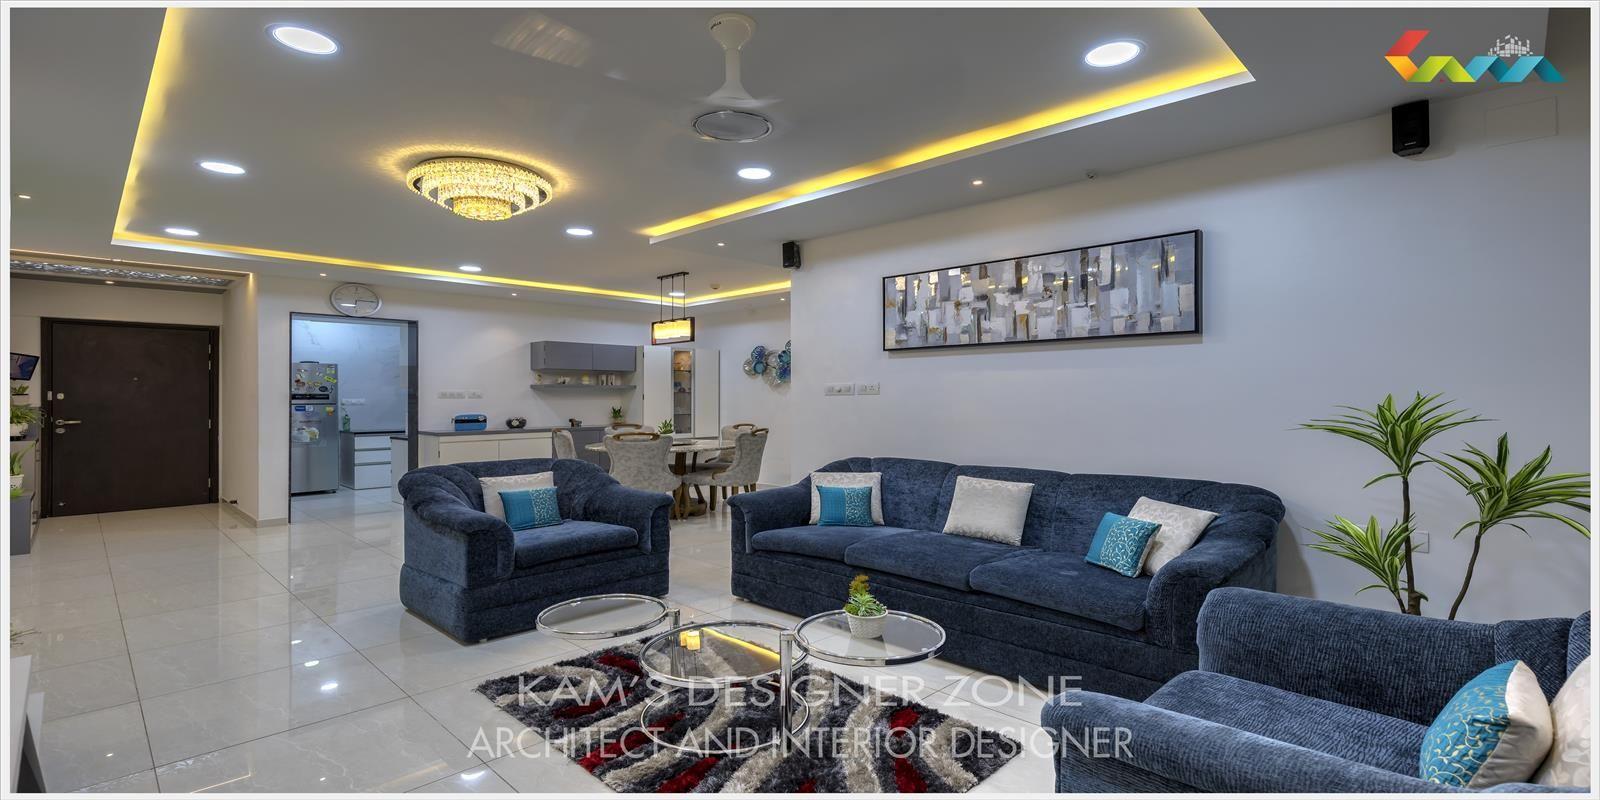 Kam S Designer Zone Design An Elegant Home On Budget In 2020